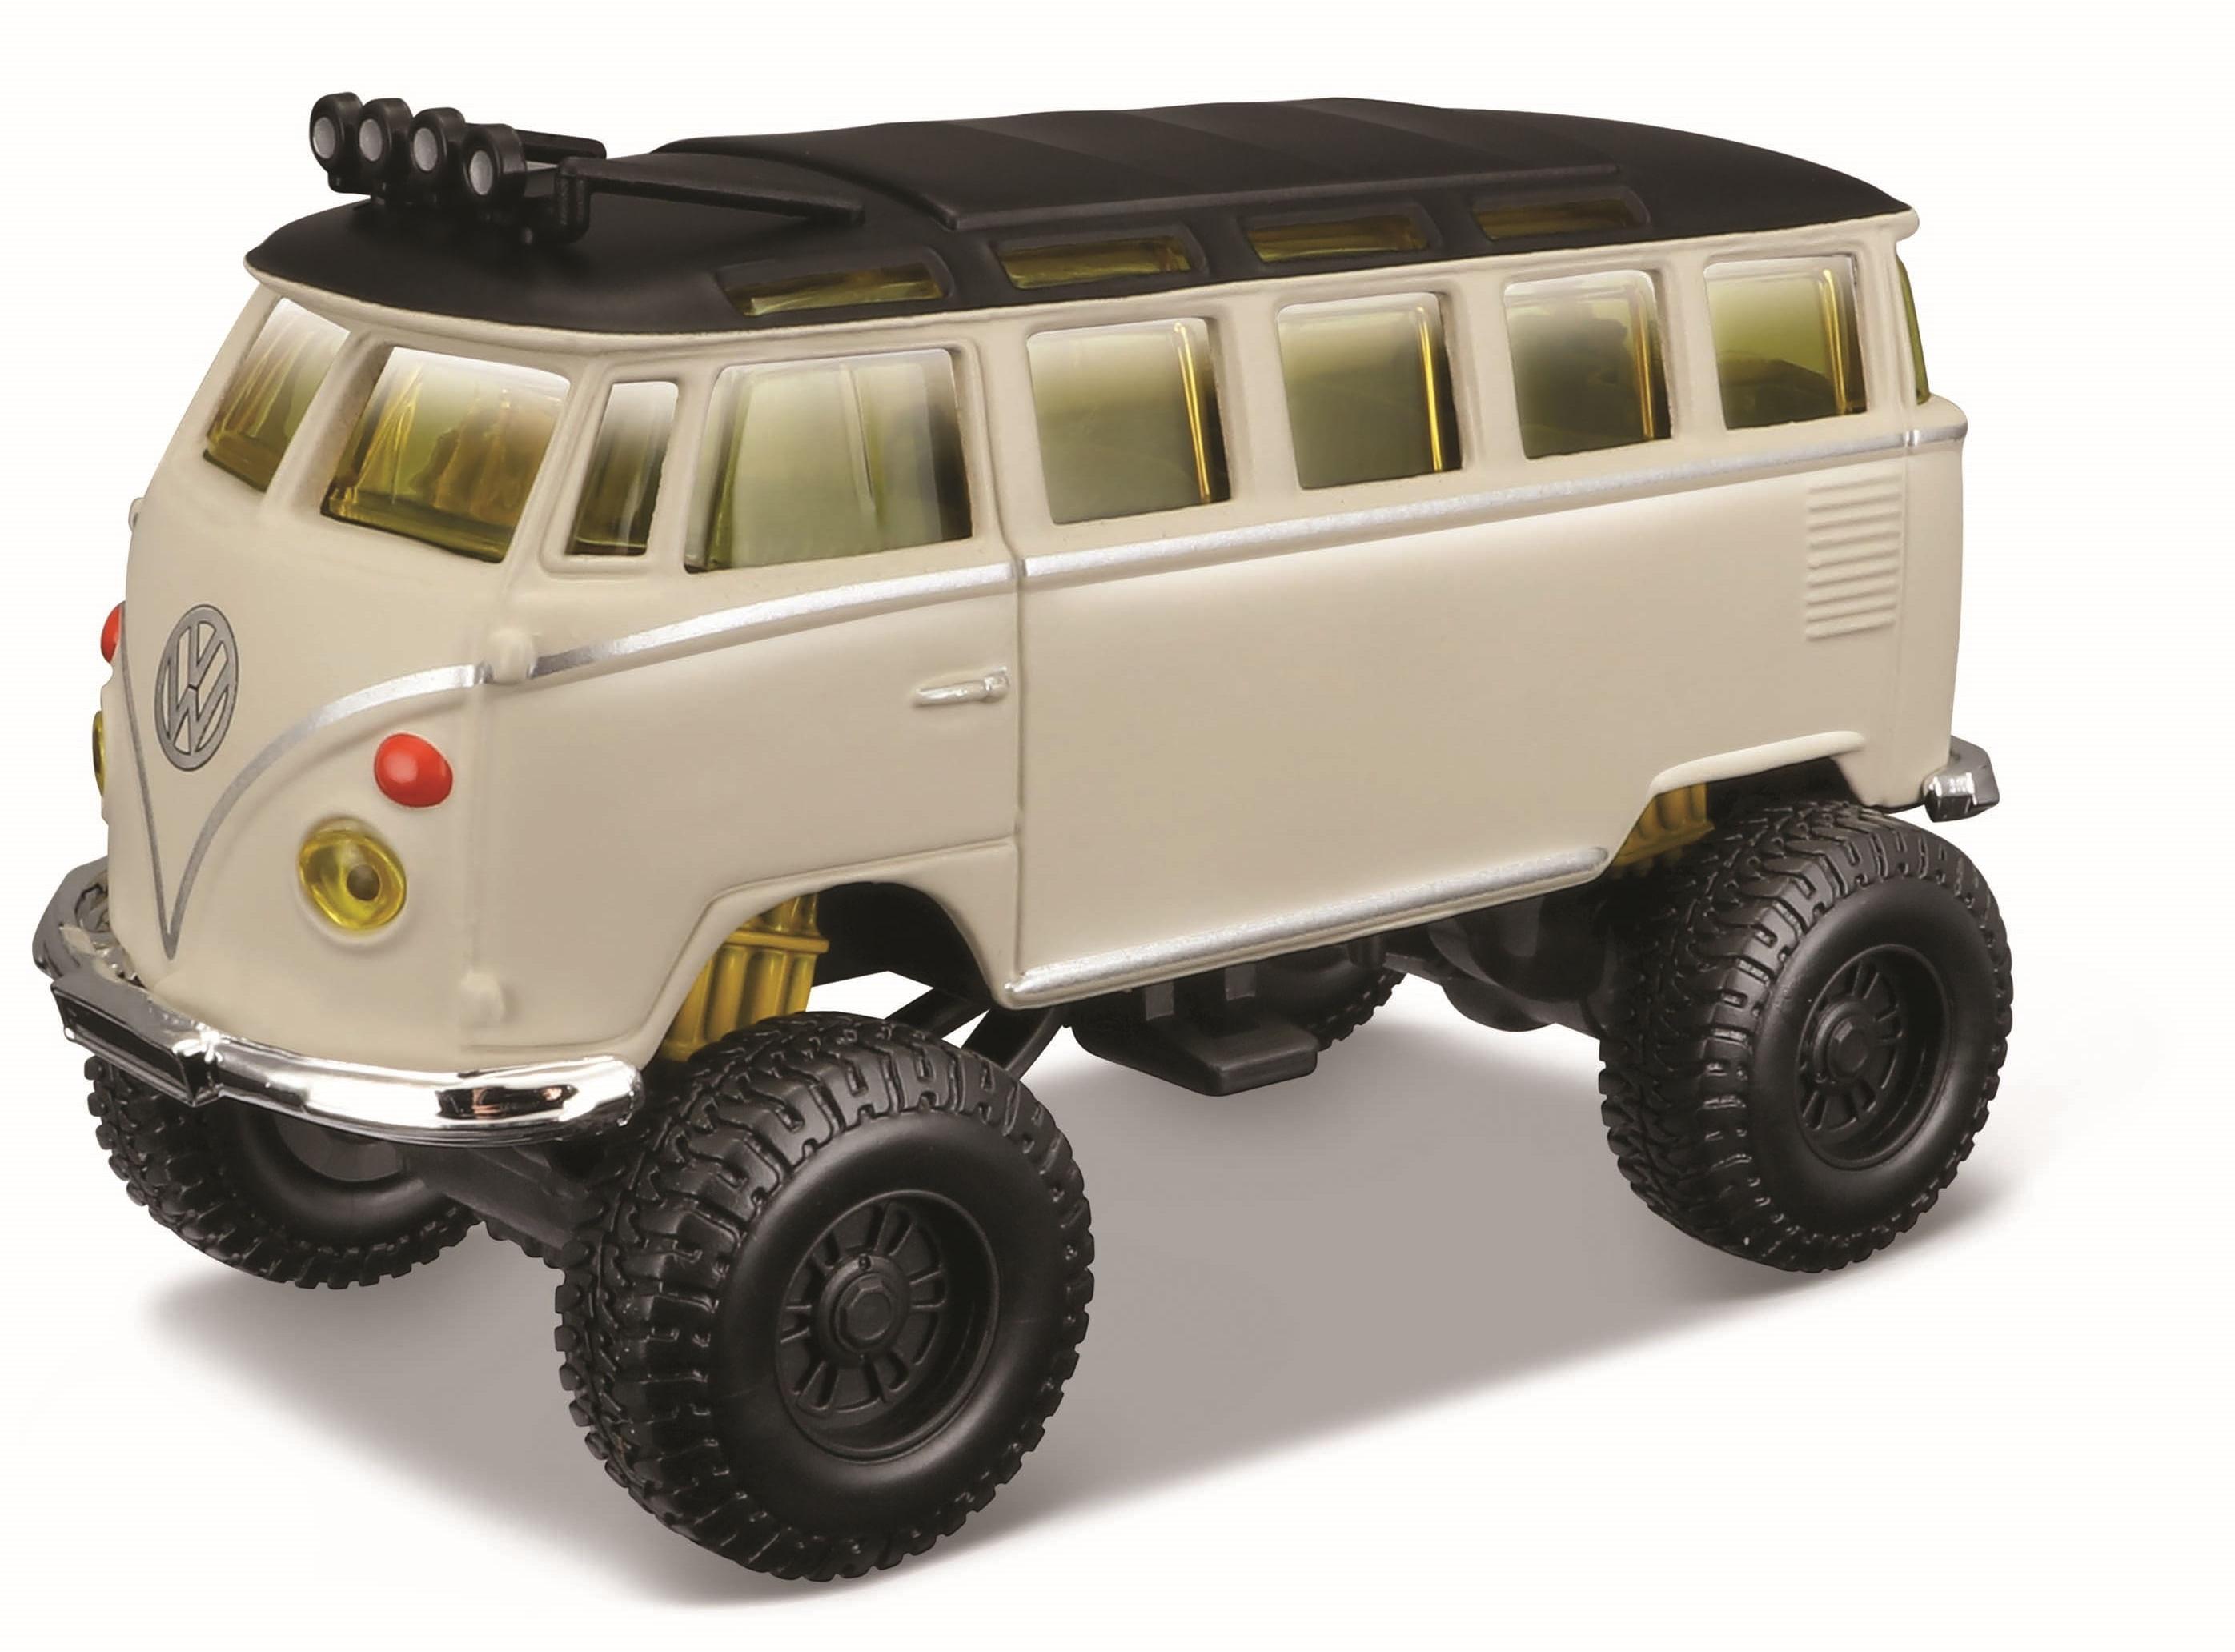 Miniatura Carro 4x4 Rebels 1 43 Maisto Fresh Metal Mai25205 Bumerang Brinquedos